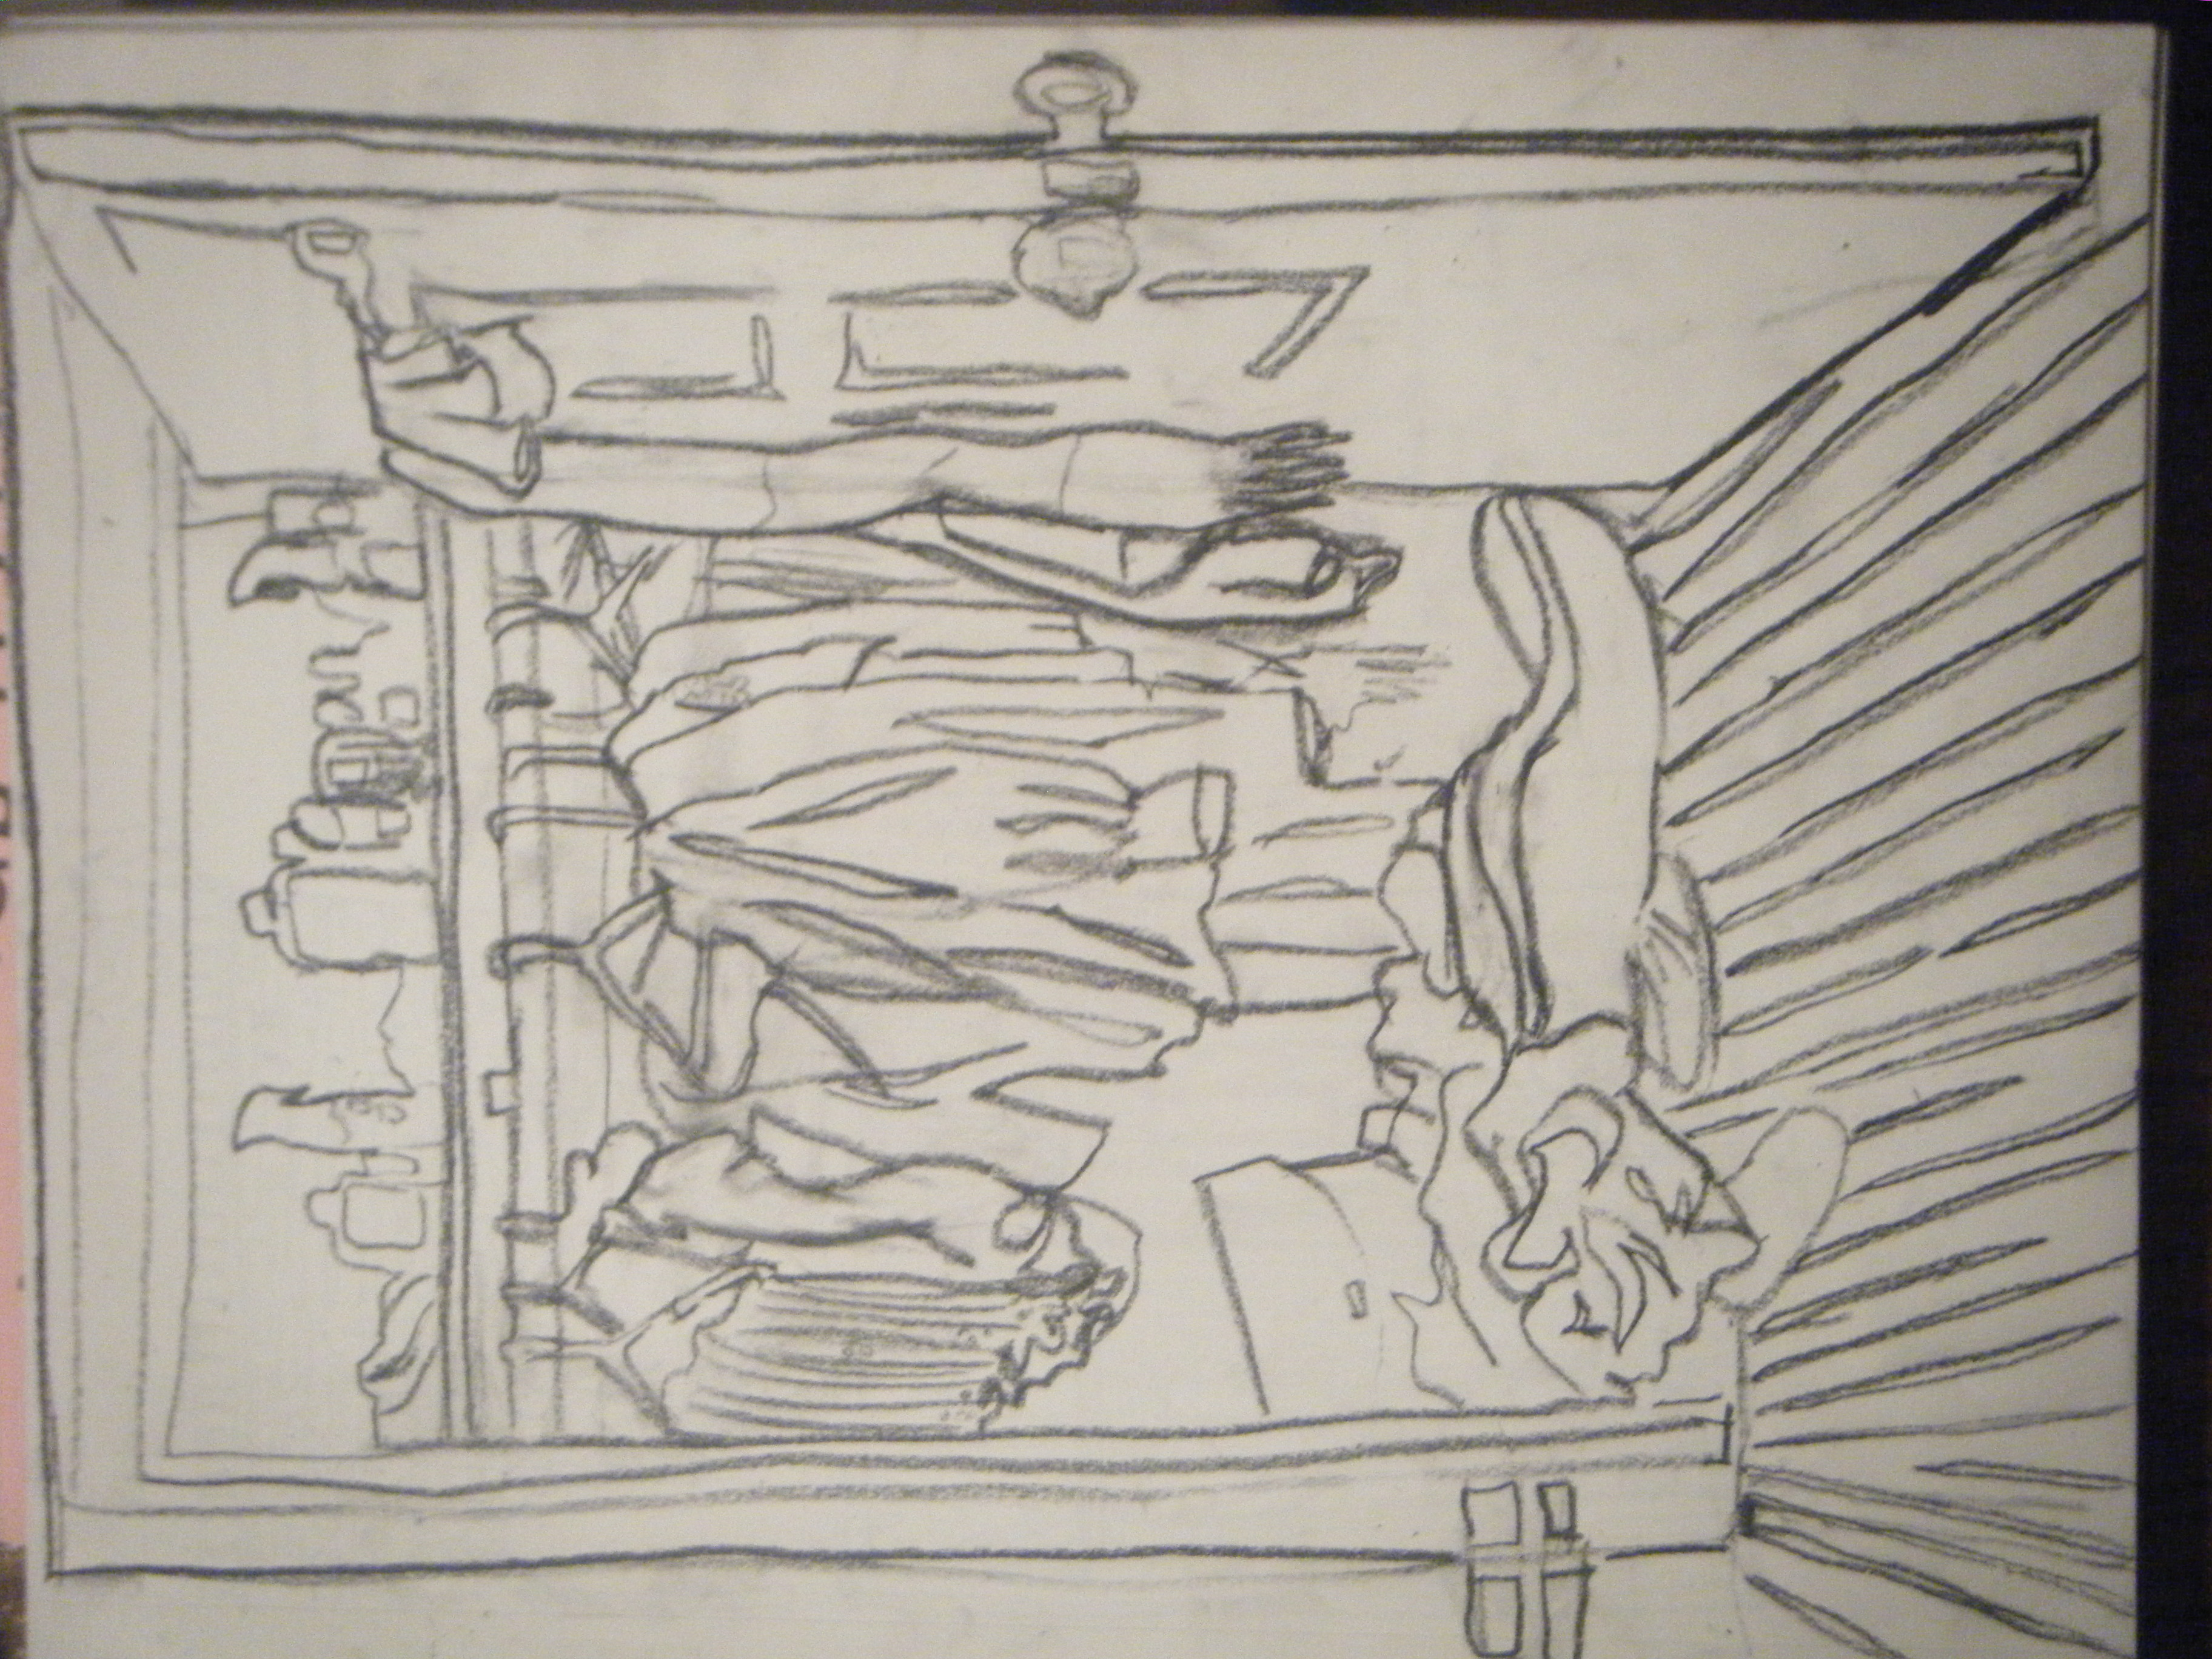 3648x2736 The Space In Between Closet Drawing âu20acu201c Lintonia Davis#39 Blog